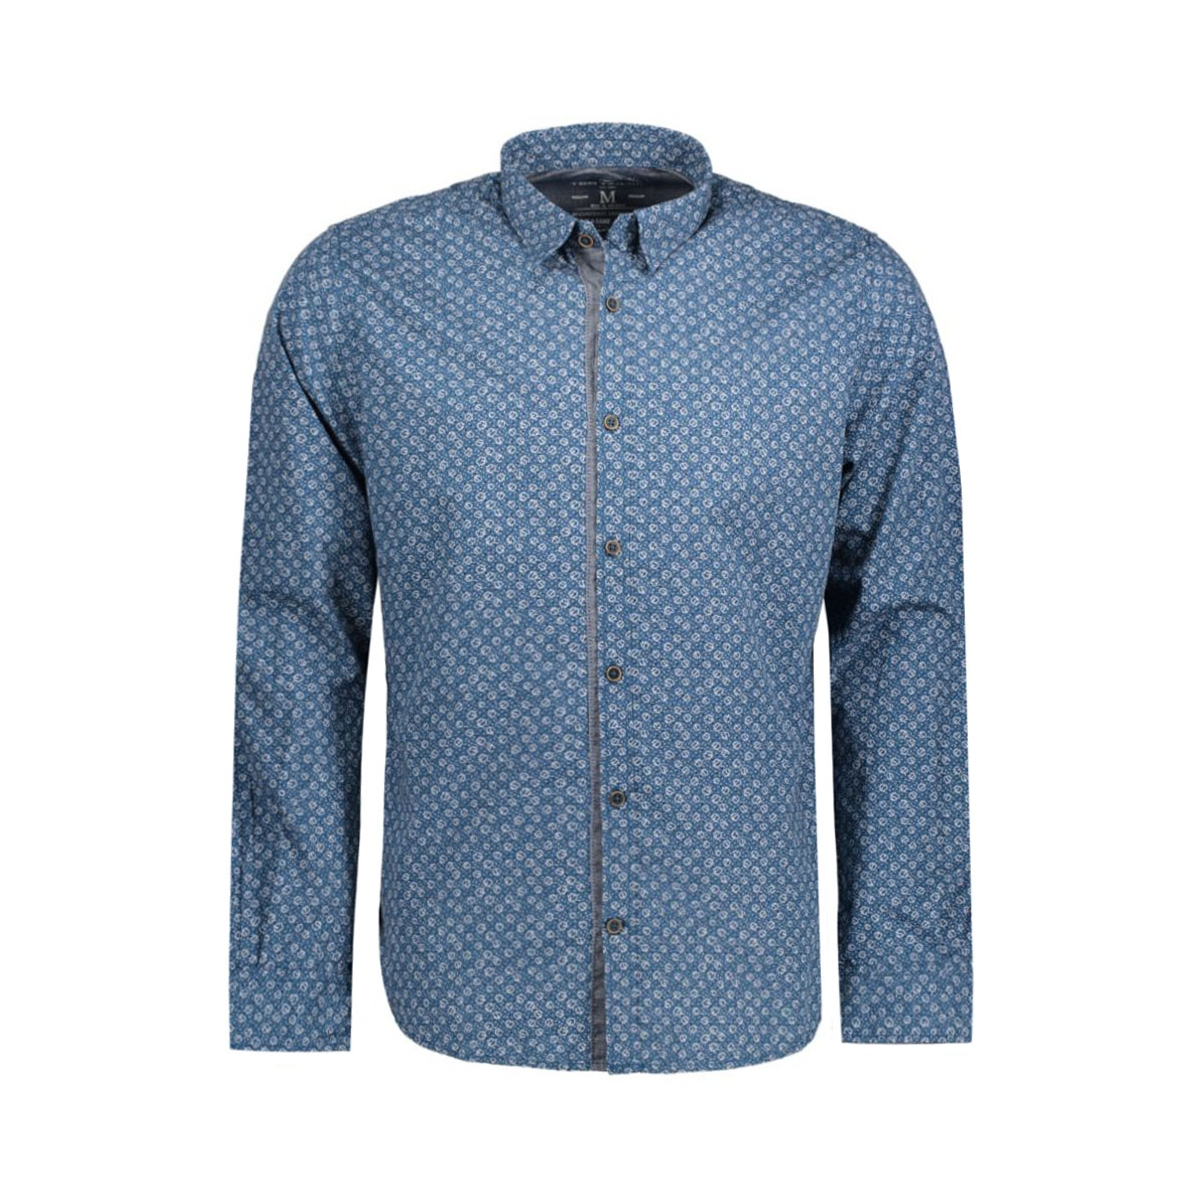 2032553.00.10 tom tailor overhemd 6012